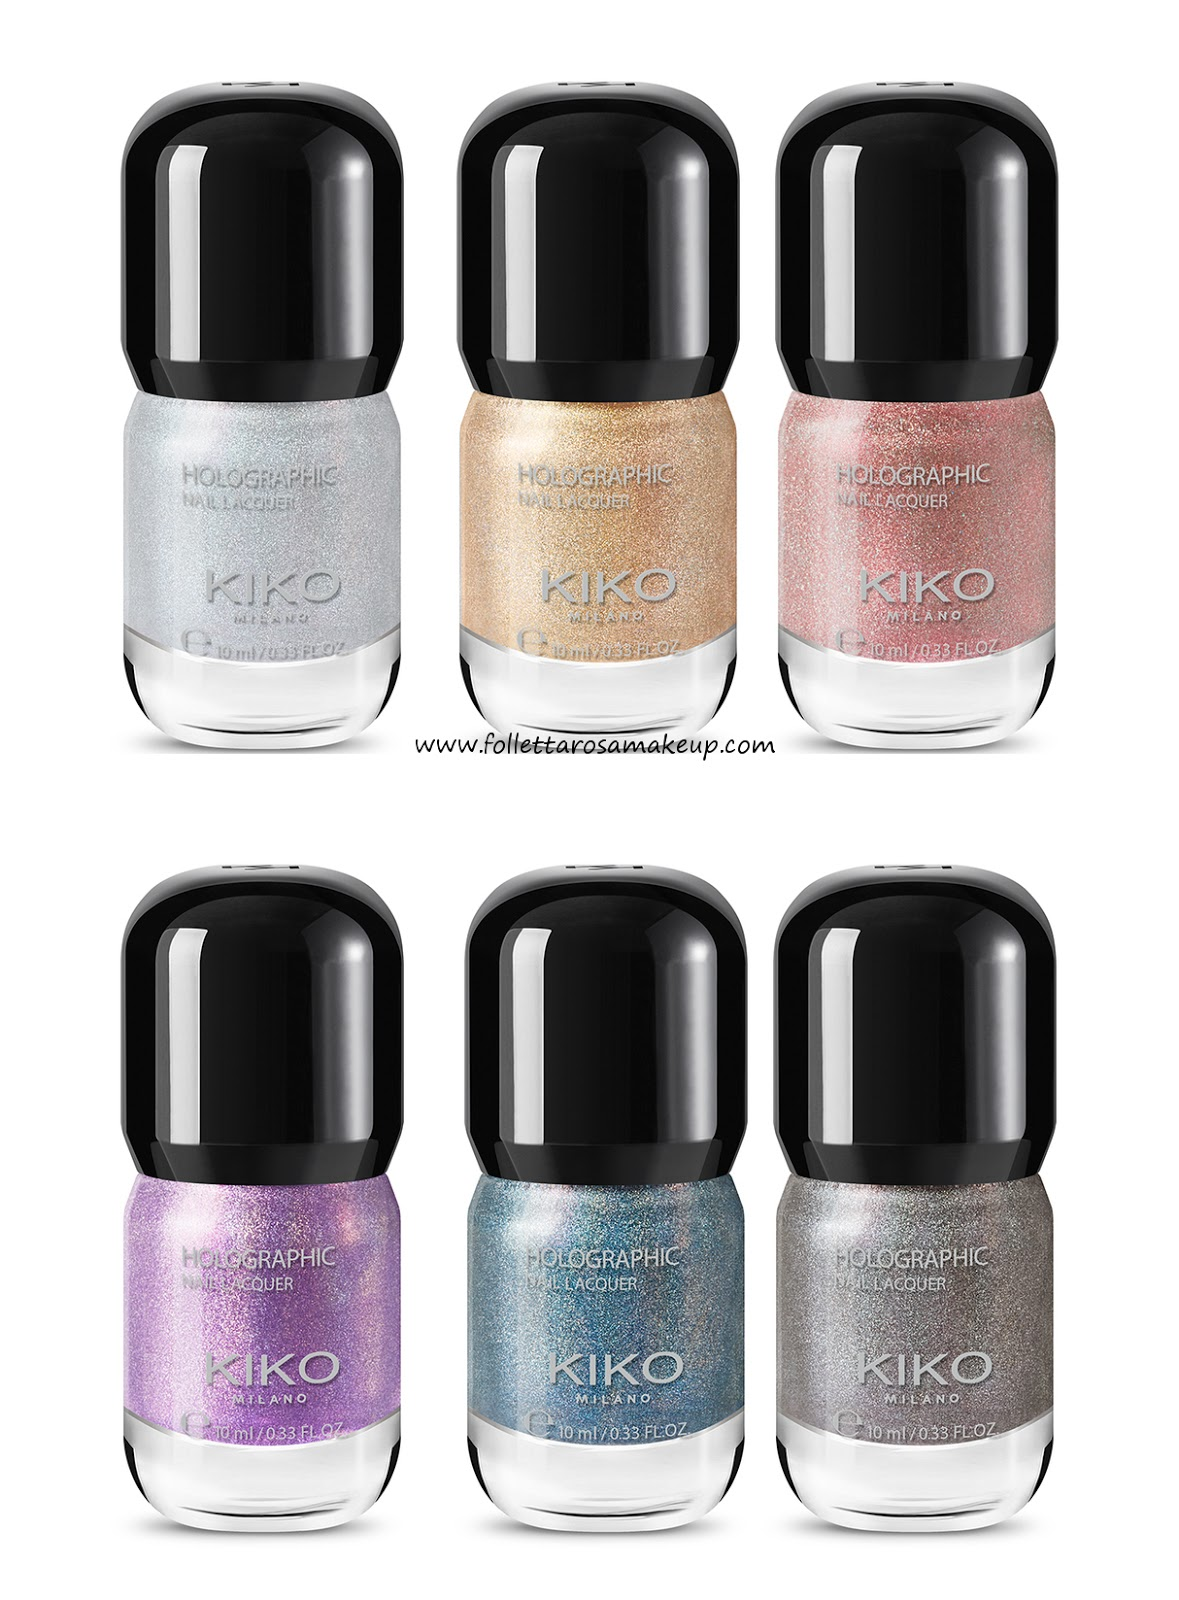 kiko-holographic-nail-lacquer